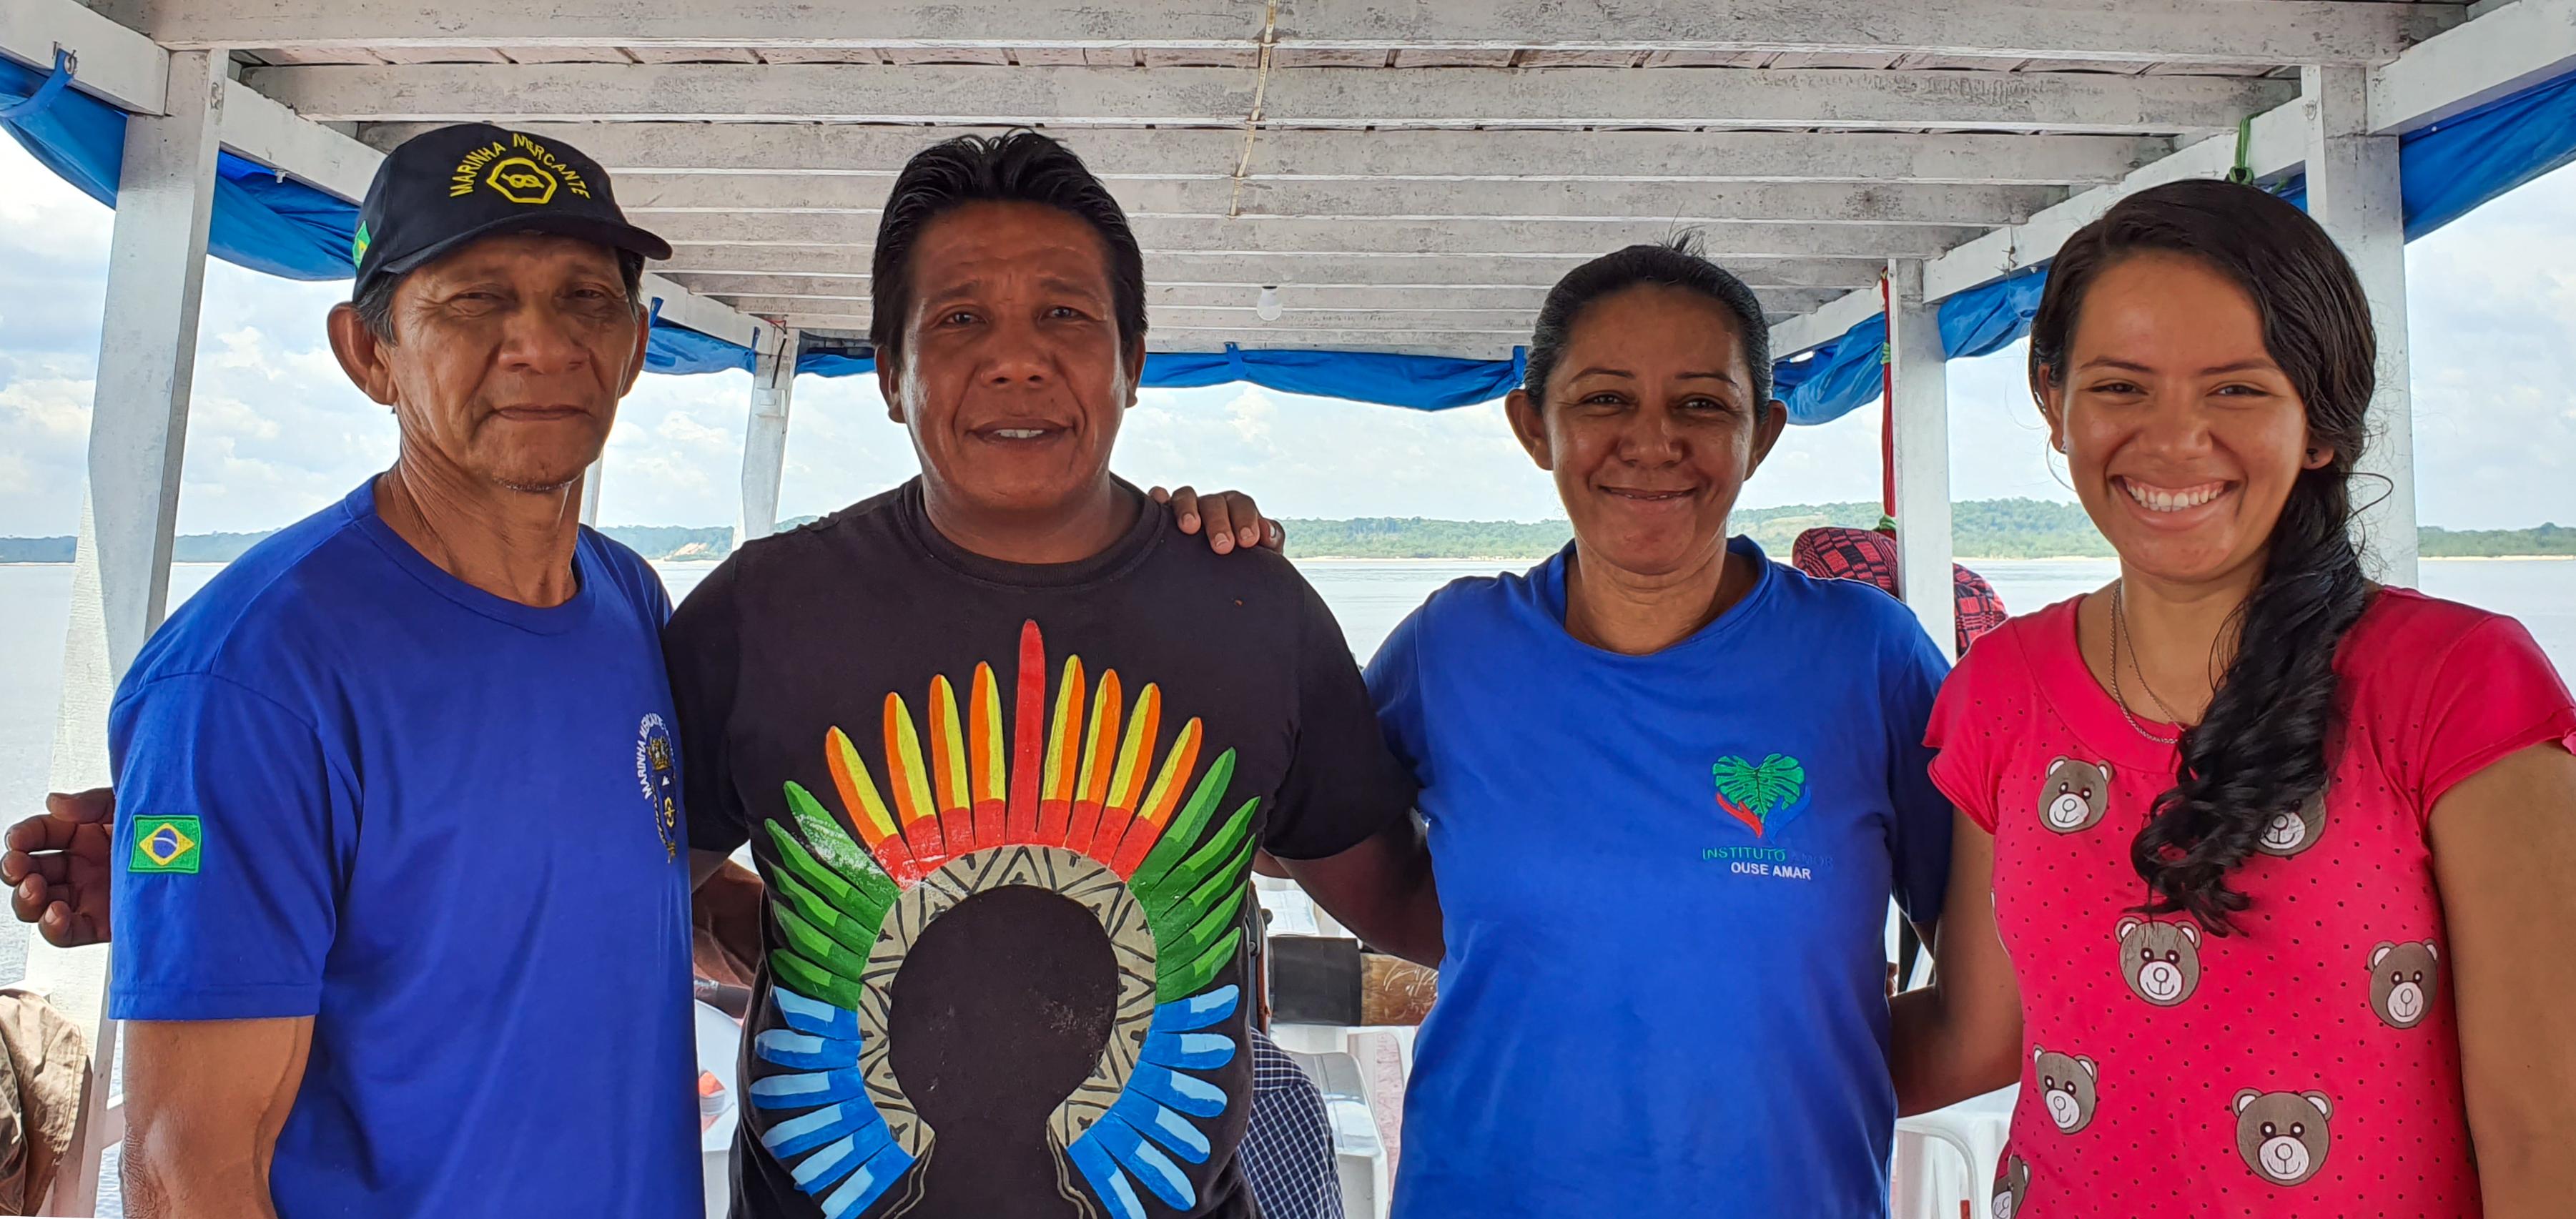 4 Indigenous people